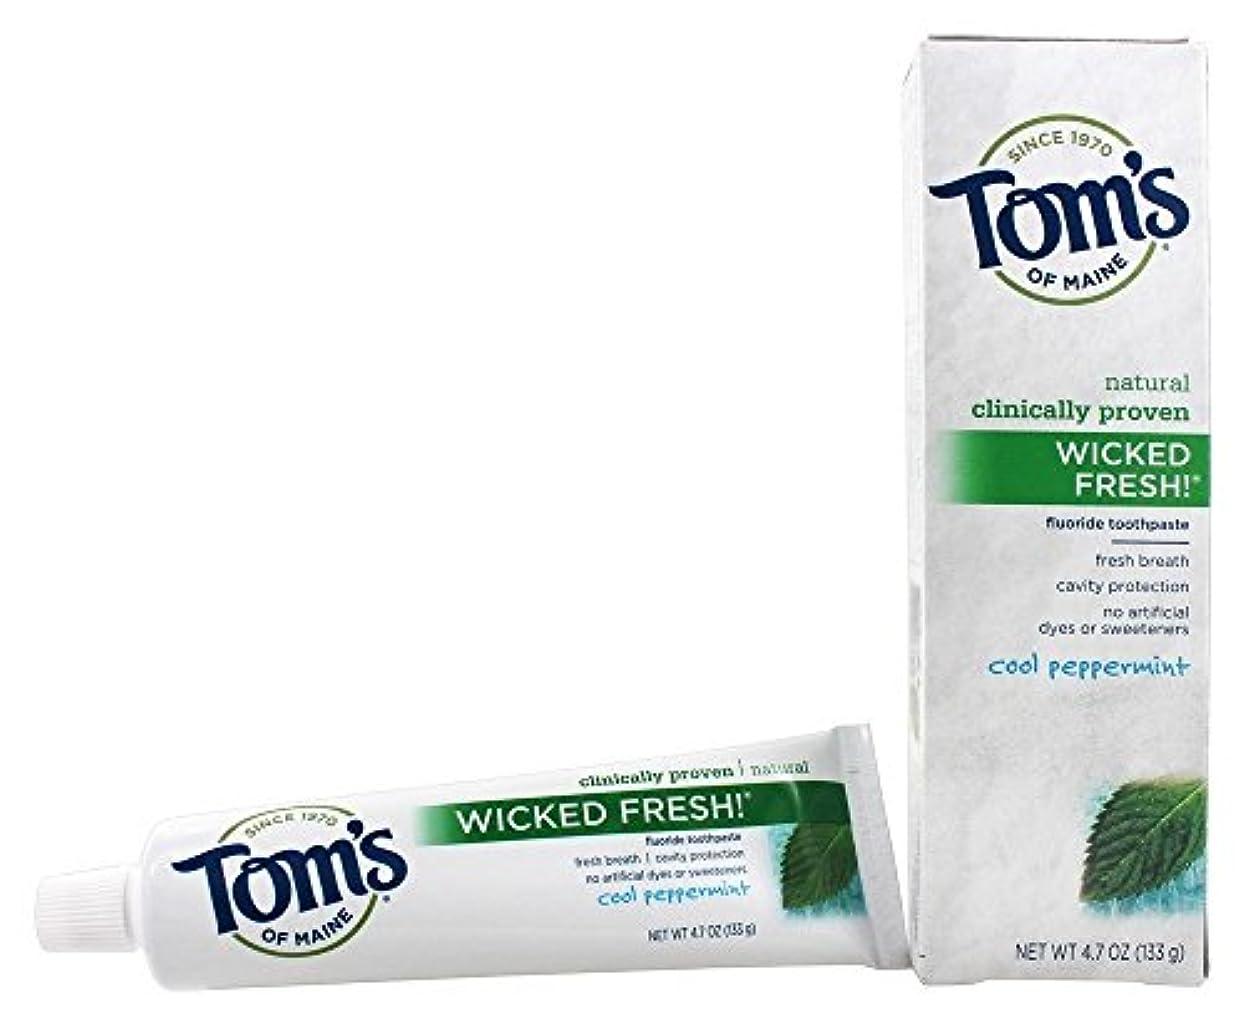 Tom's of Maine ナチュラル邪悪な新鮮なフッ化物の歯磨き粉クールペパーミント4.70オズ